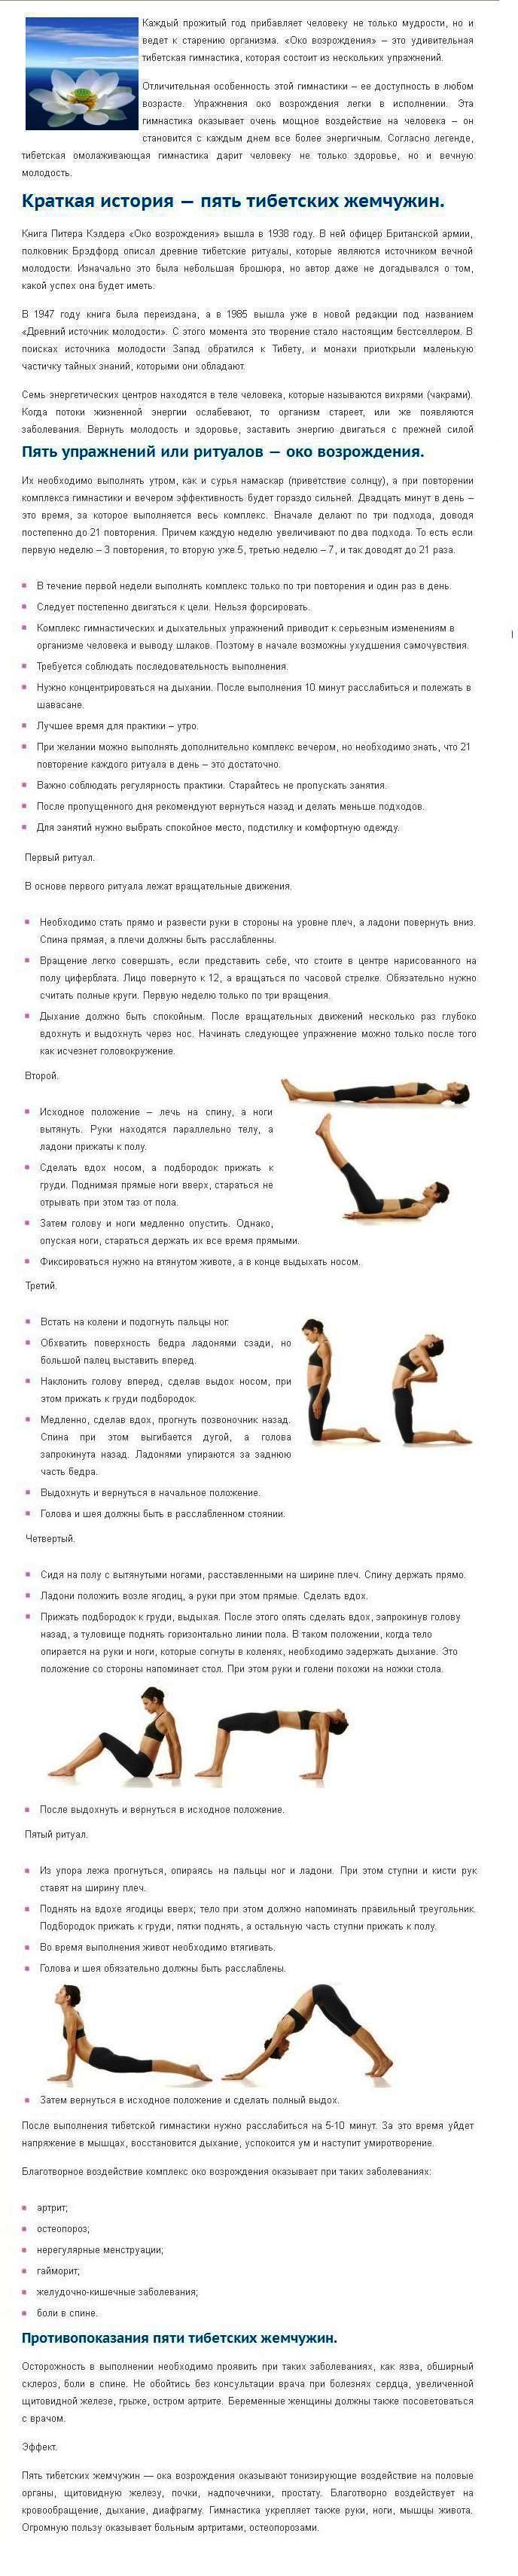 http://img-fotki.yandex.ru/get/6416/154087707.23/0_98bf8_b023de04_orig